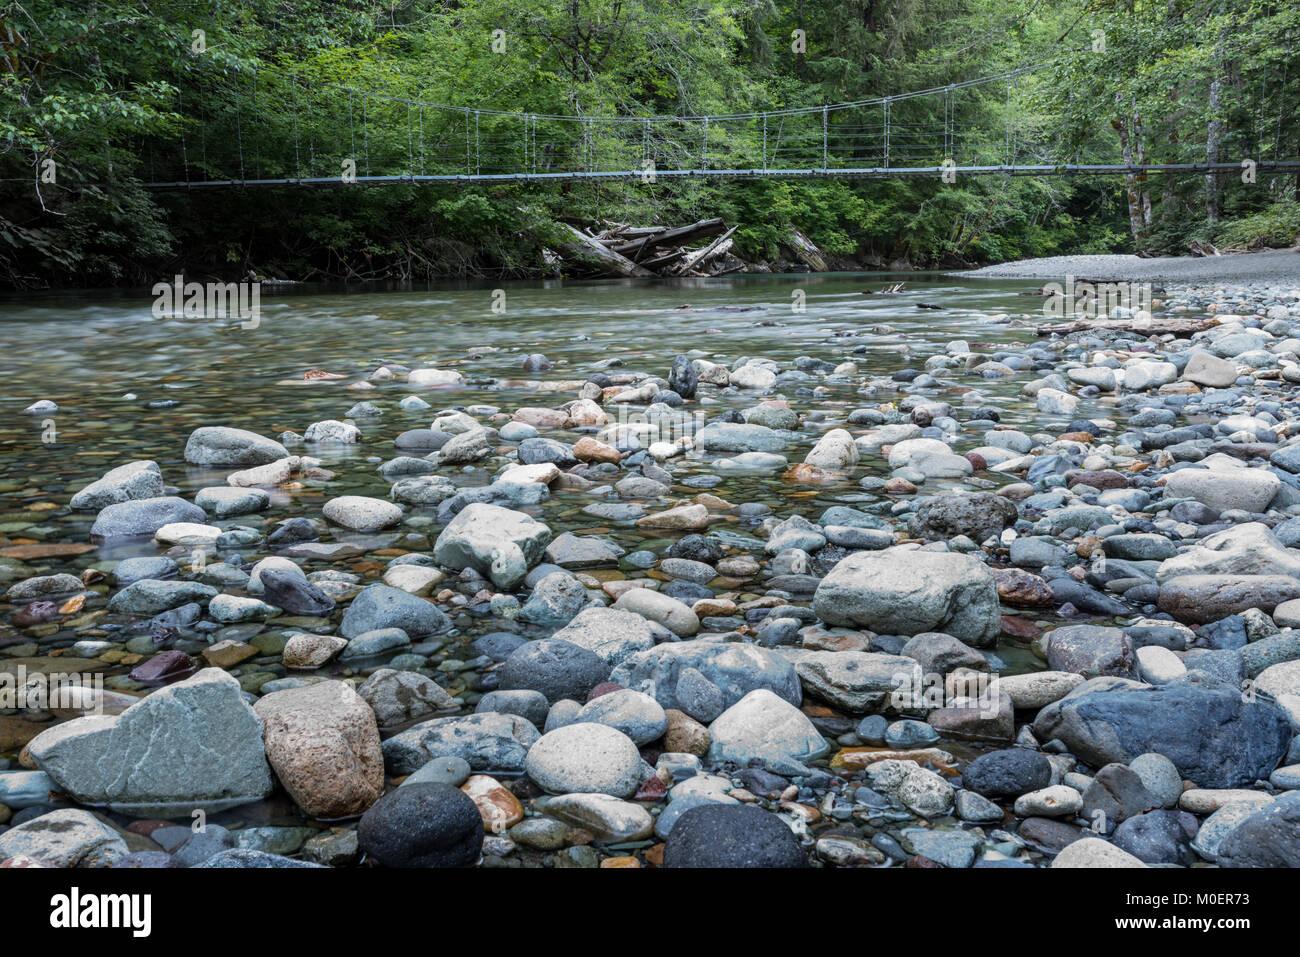 Suspension Bridge Over Rocky Creek in the Cascade mountains - Stock Image